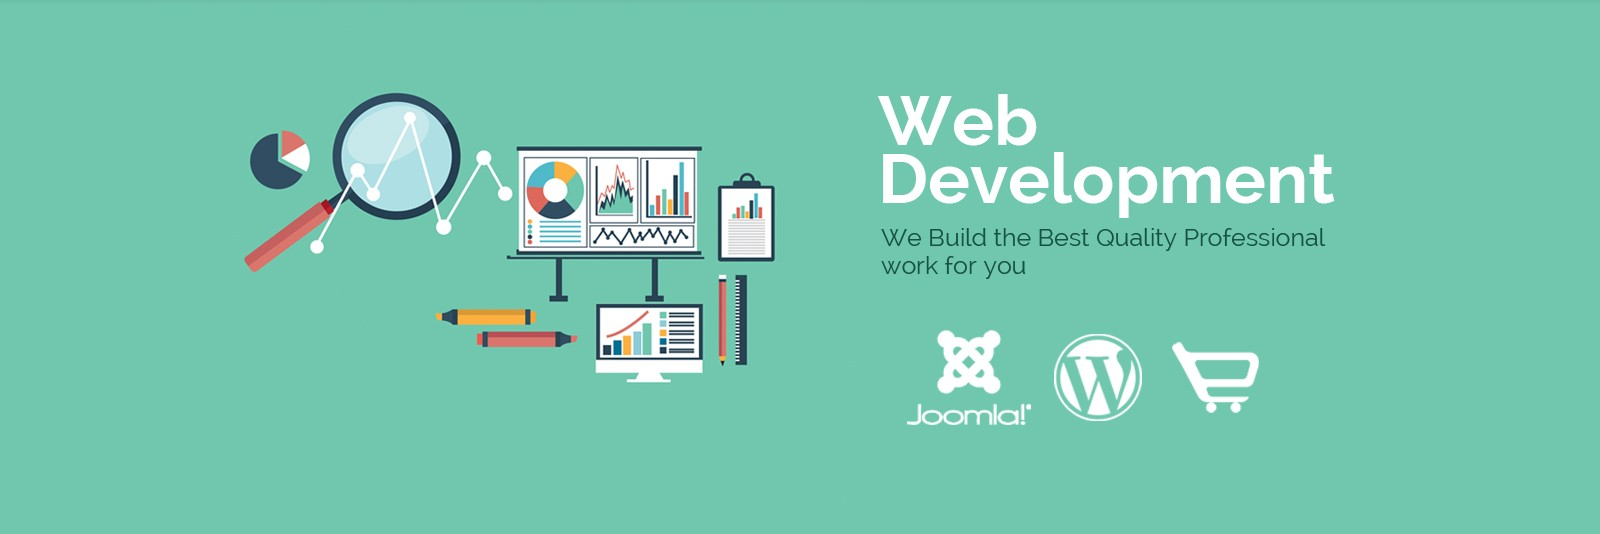 Top 10 Web Development Companies in Mumbai, Five Online